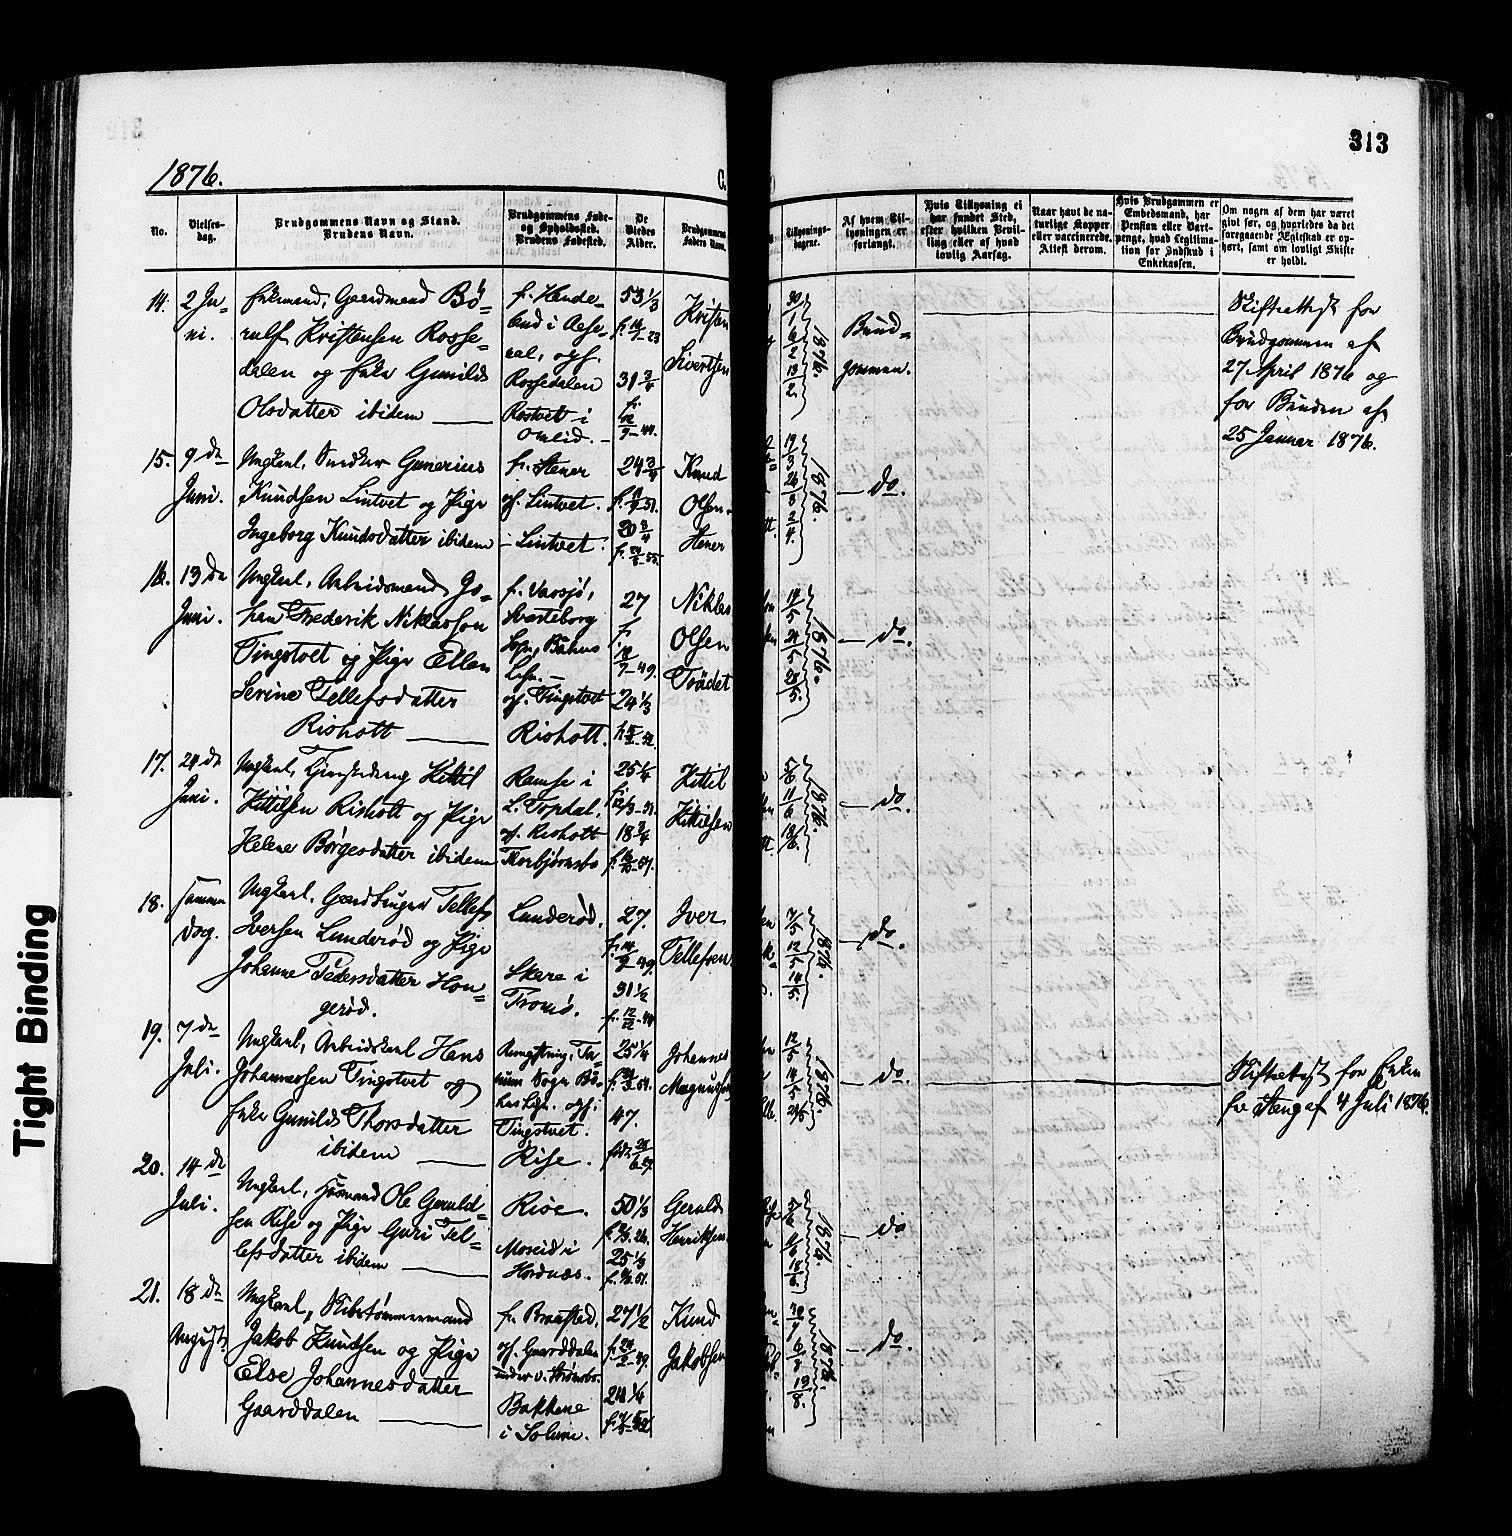 SAK, Øyestad sokneprestkontor, F/Fa/L0016: Ministerialbok nr. A 16, 1874-1886, s. 313